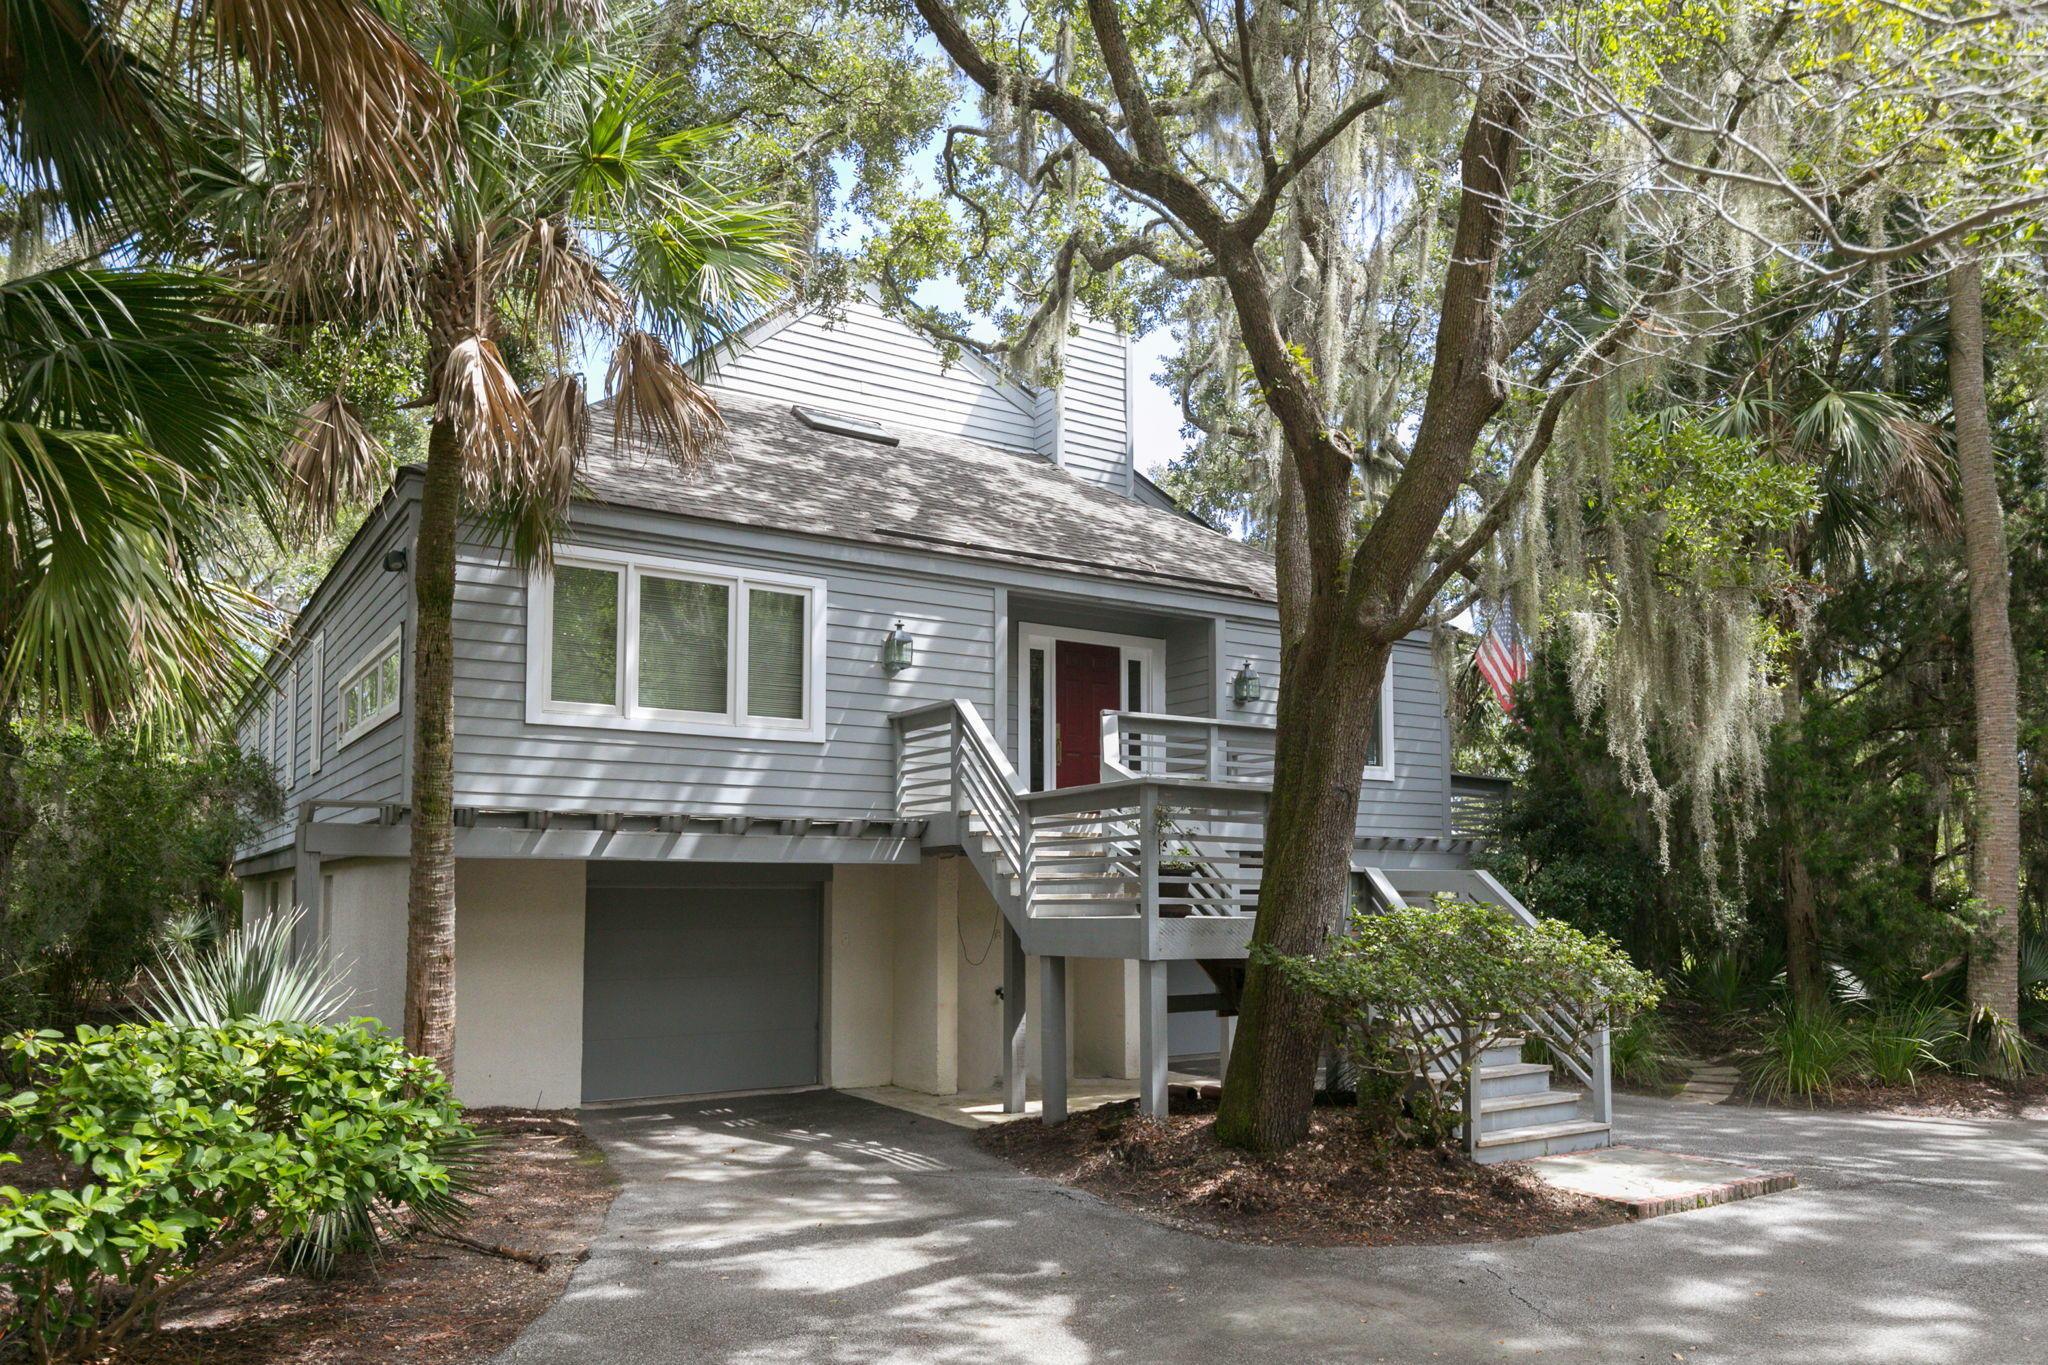 Seabrook Island Homes For Sale - 3360 Seabrook Island, Seabrook Island, SC - 60